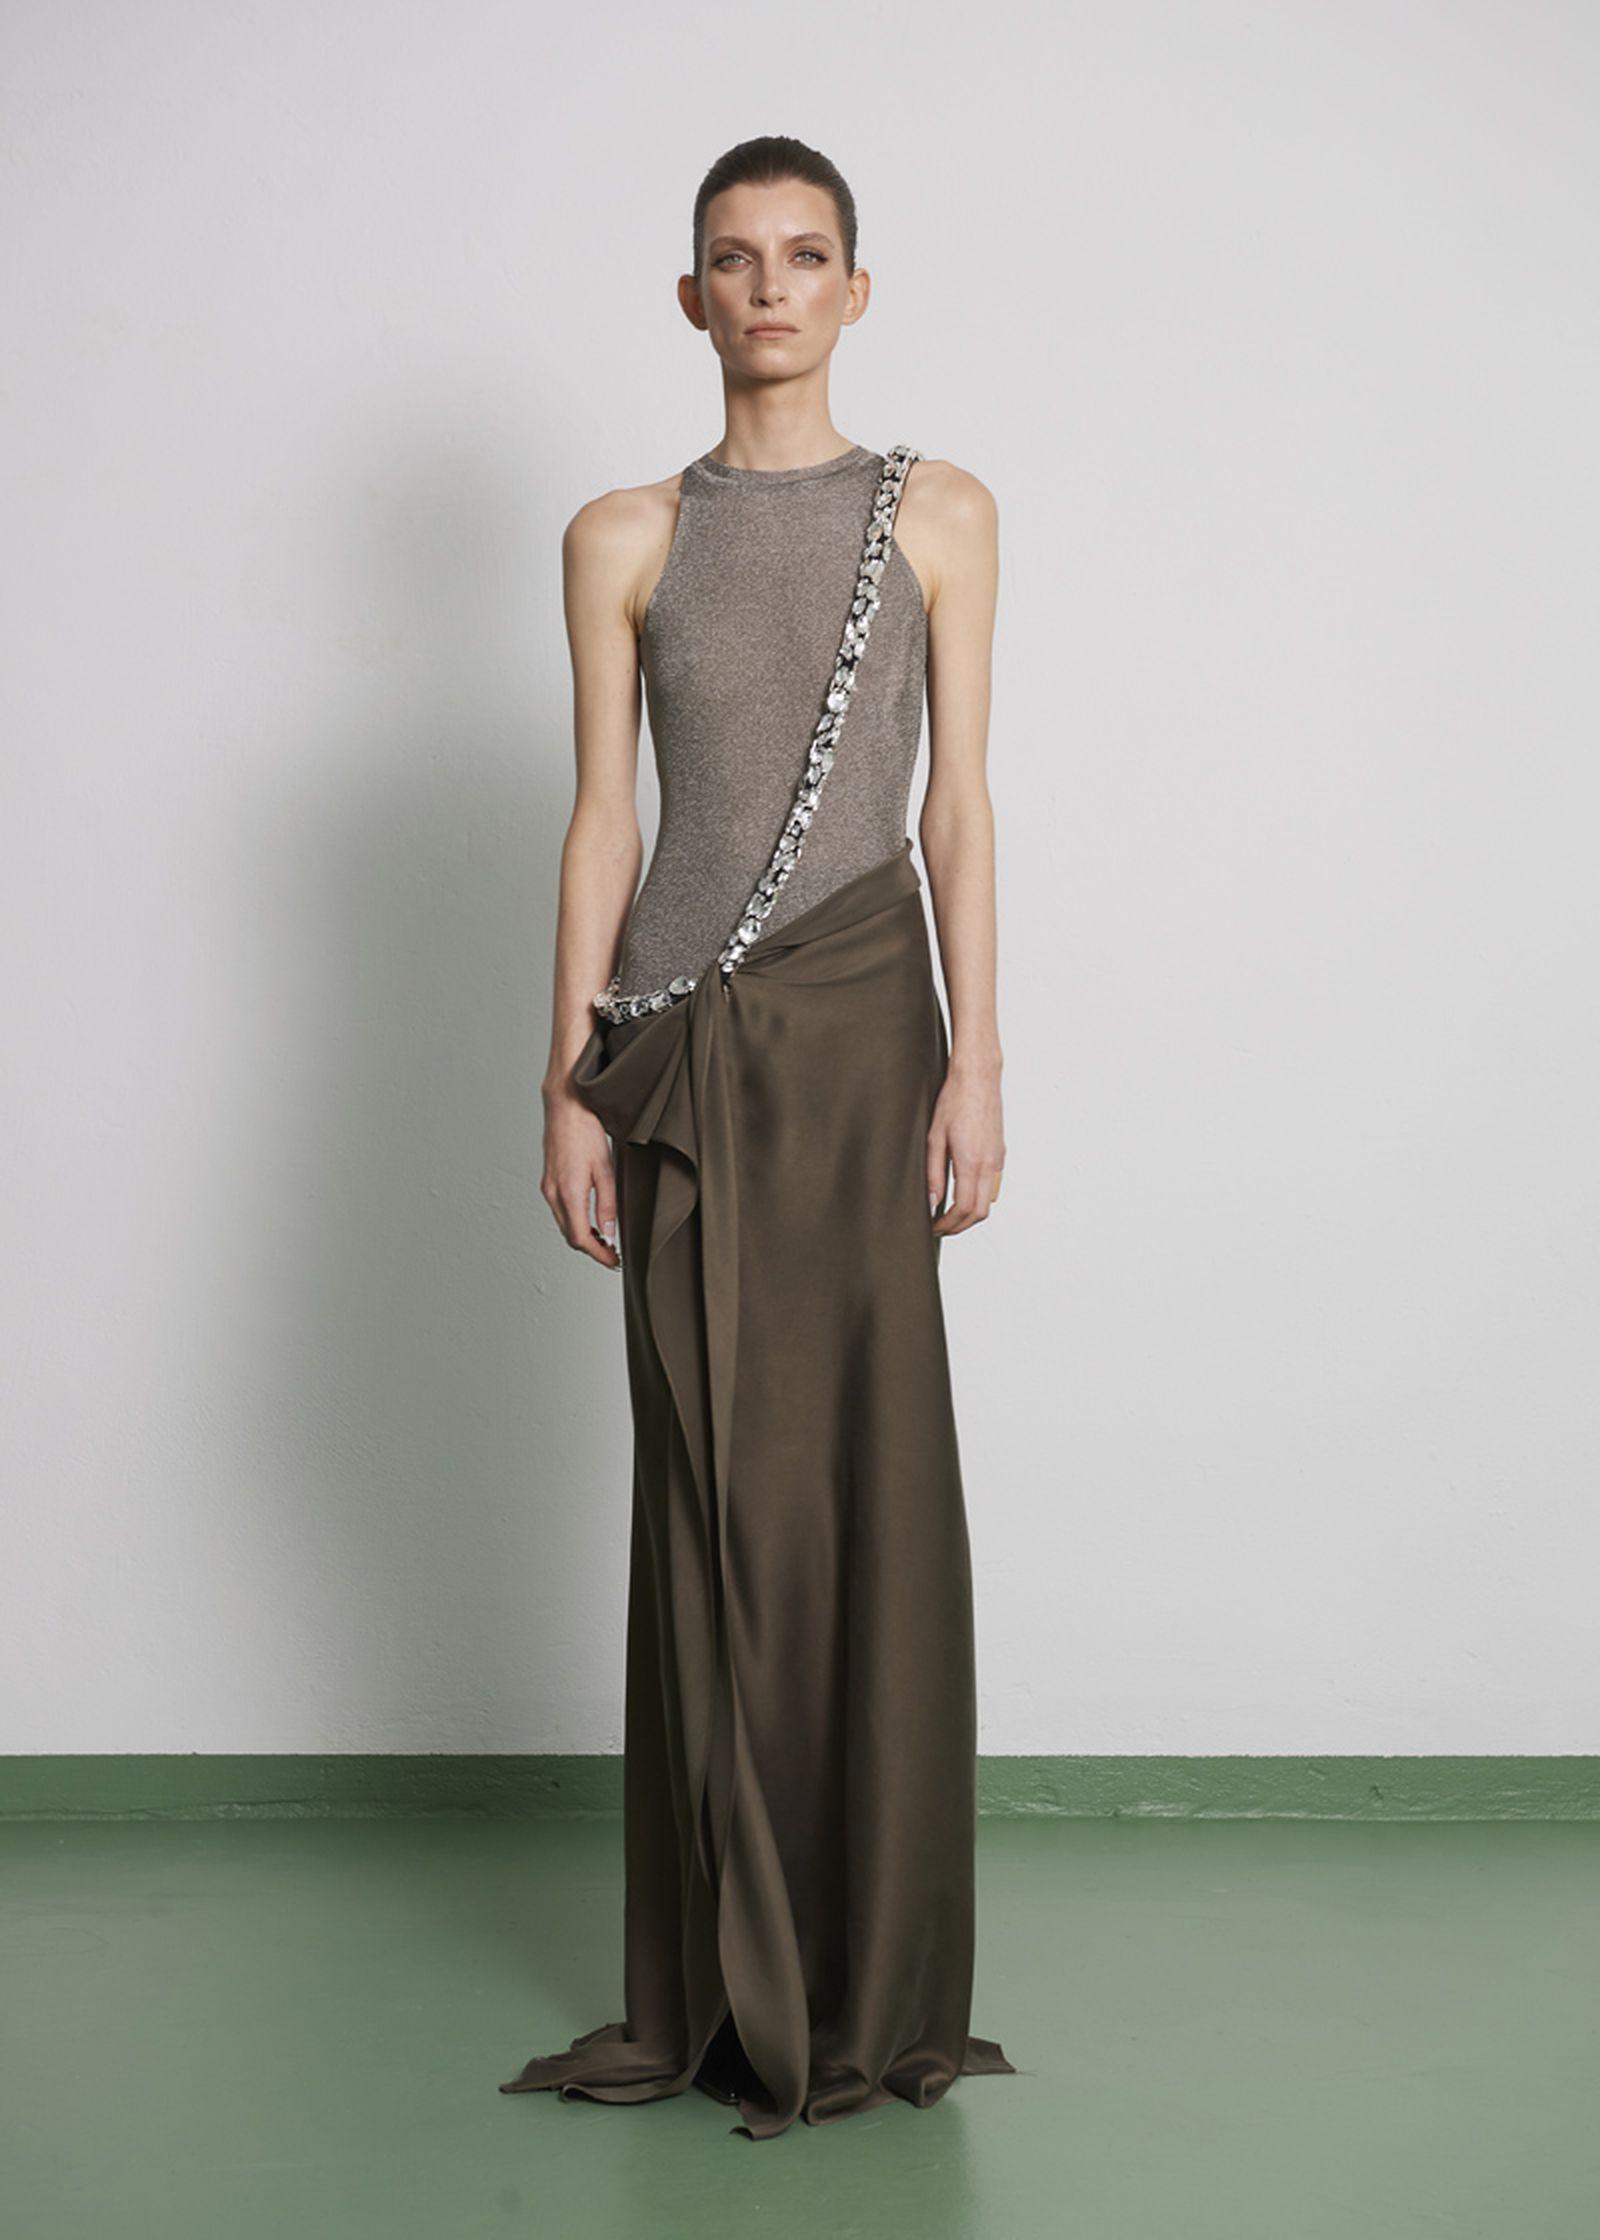 032c-rtw-womenswear-collection-paris-8